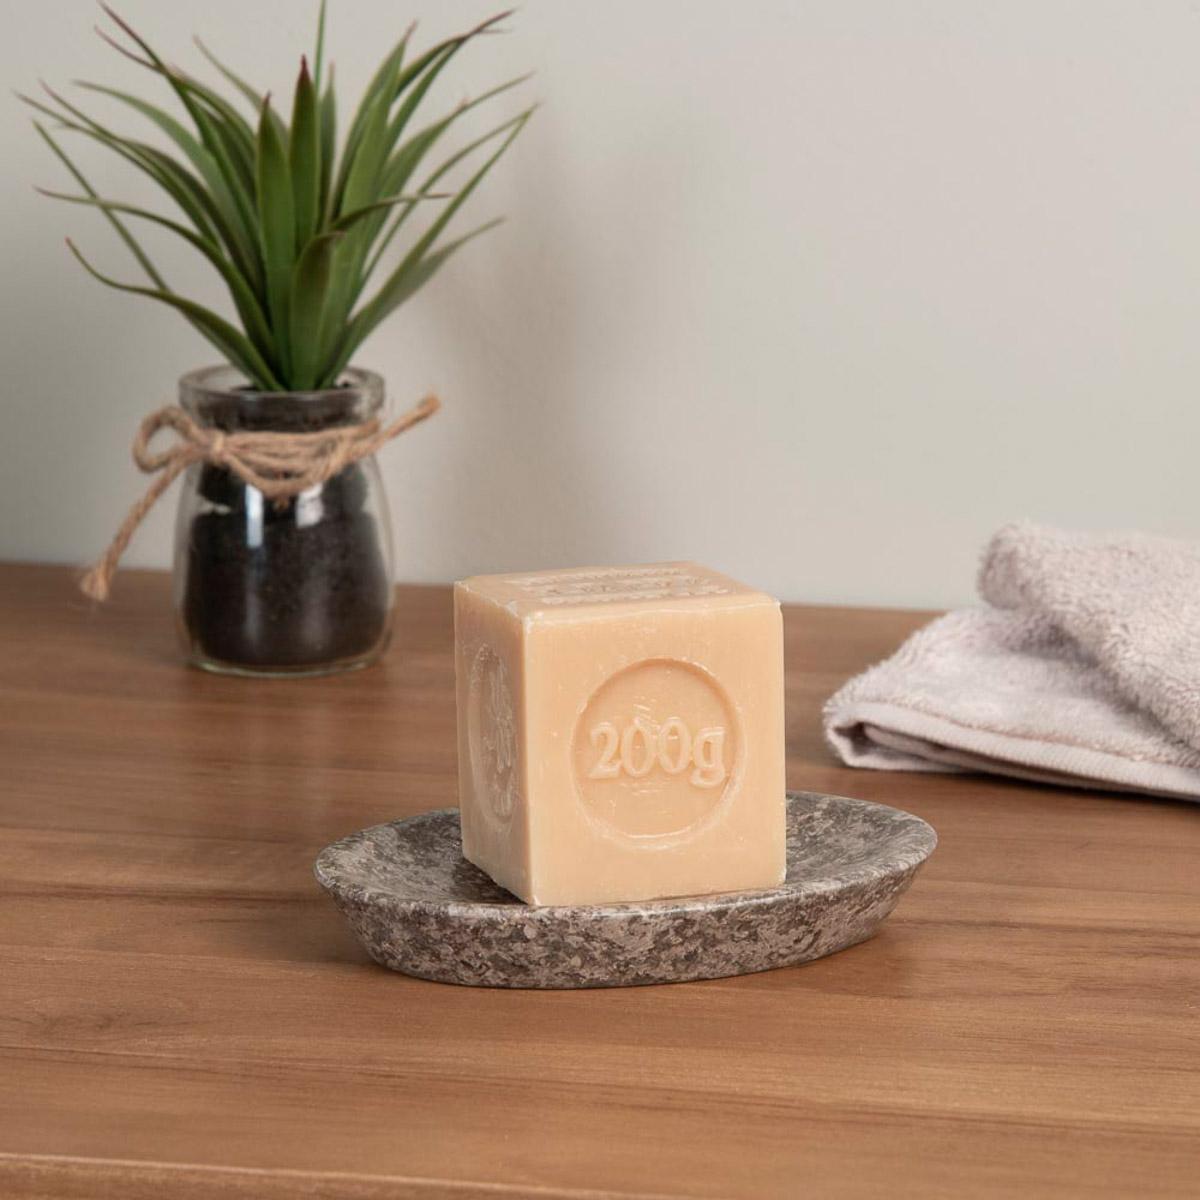 Porte savon de salle de bain en marbre gris h 16 cm for Accessoire salle de bain marbre